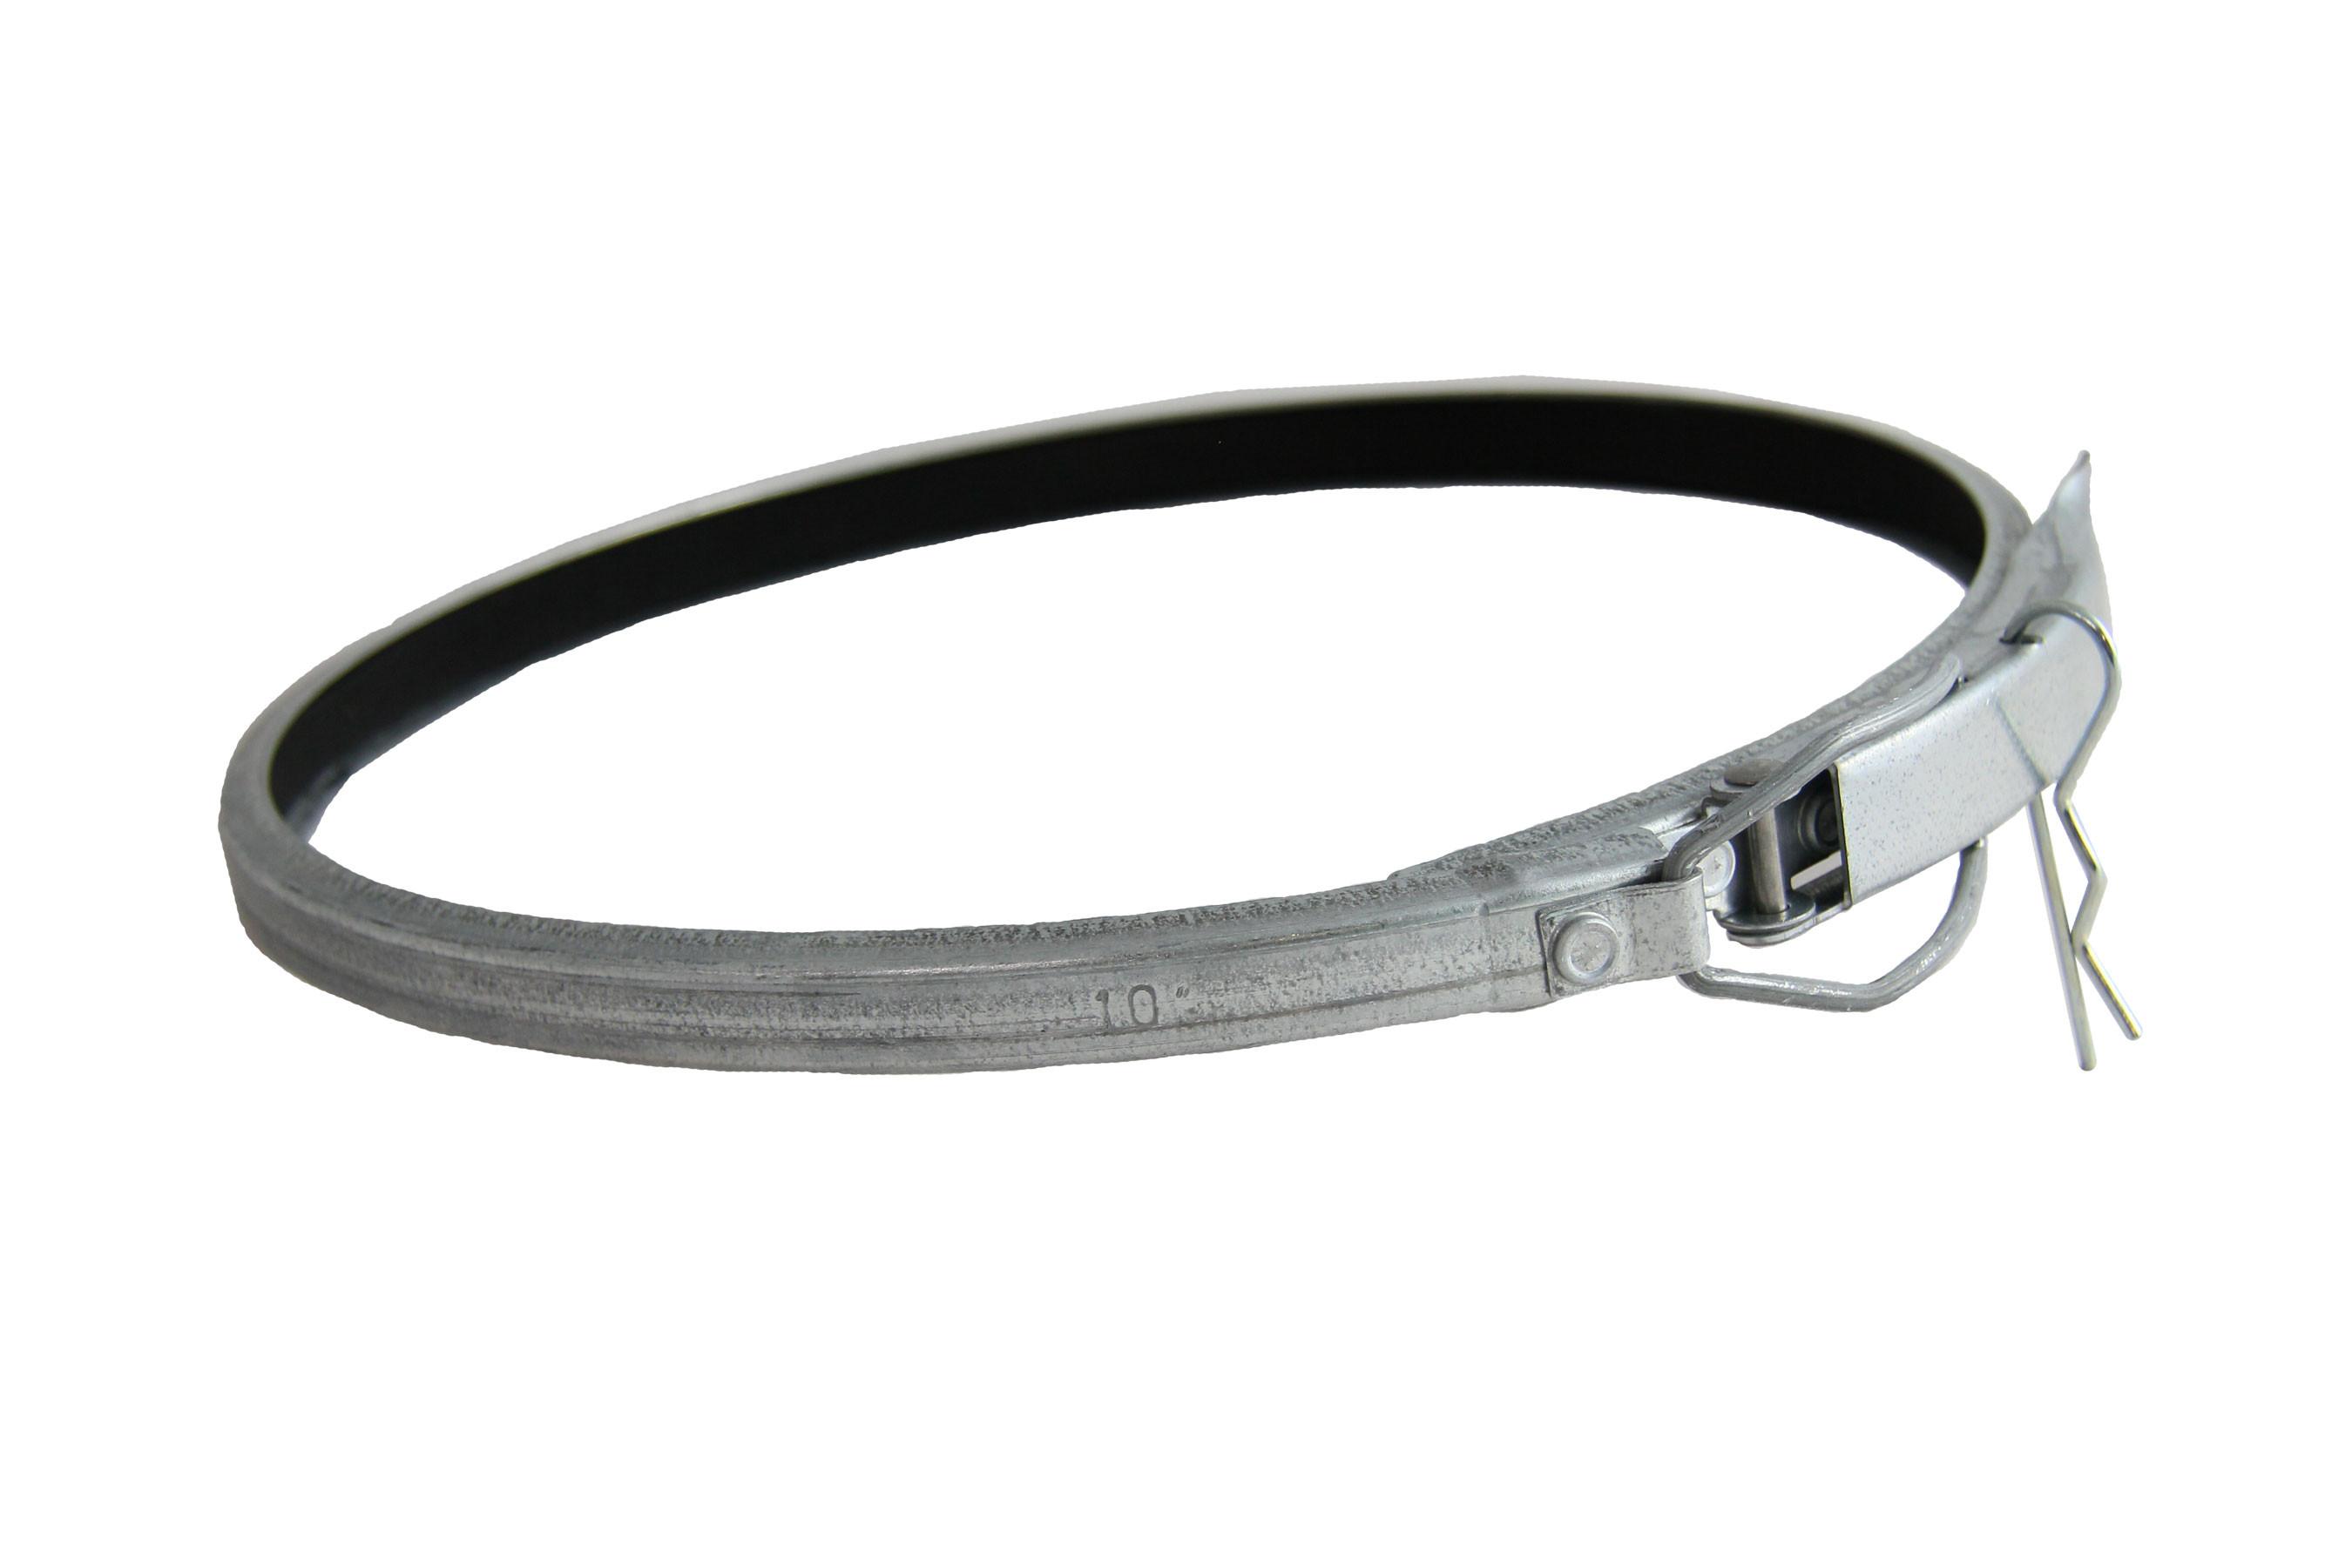 Rohrschelle NW 305 AERO-051